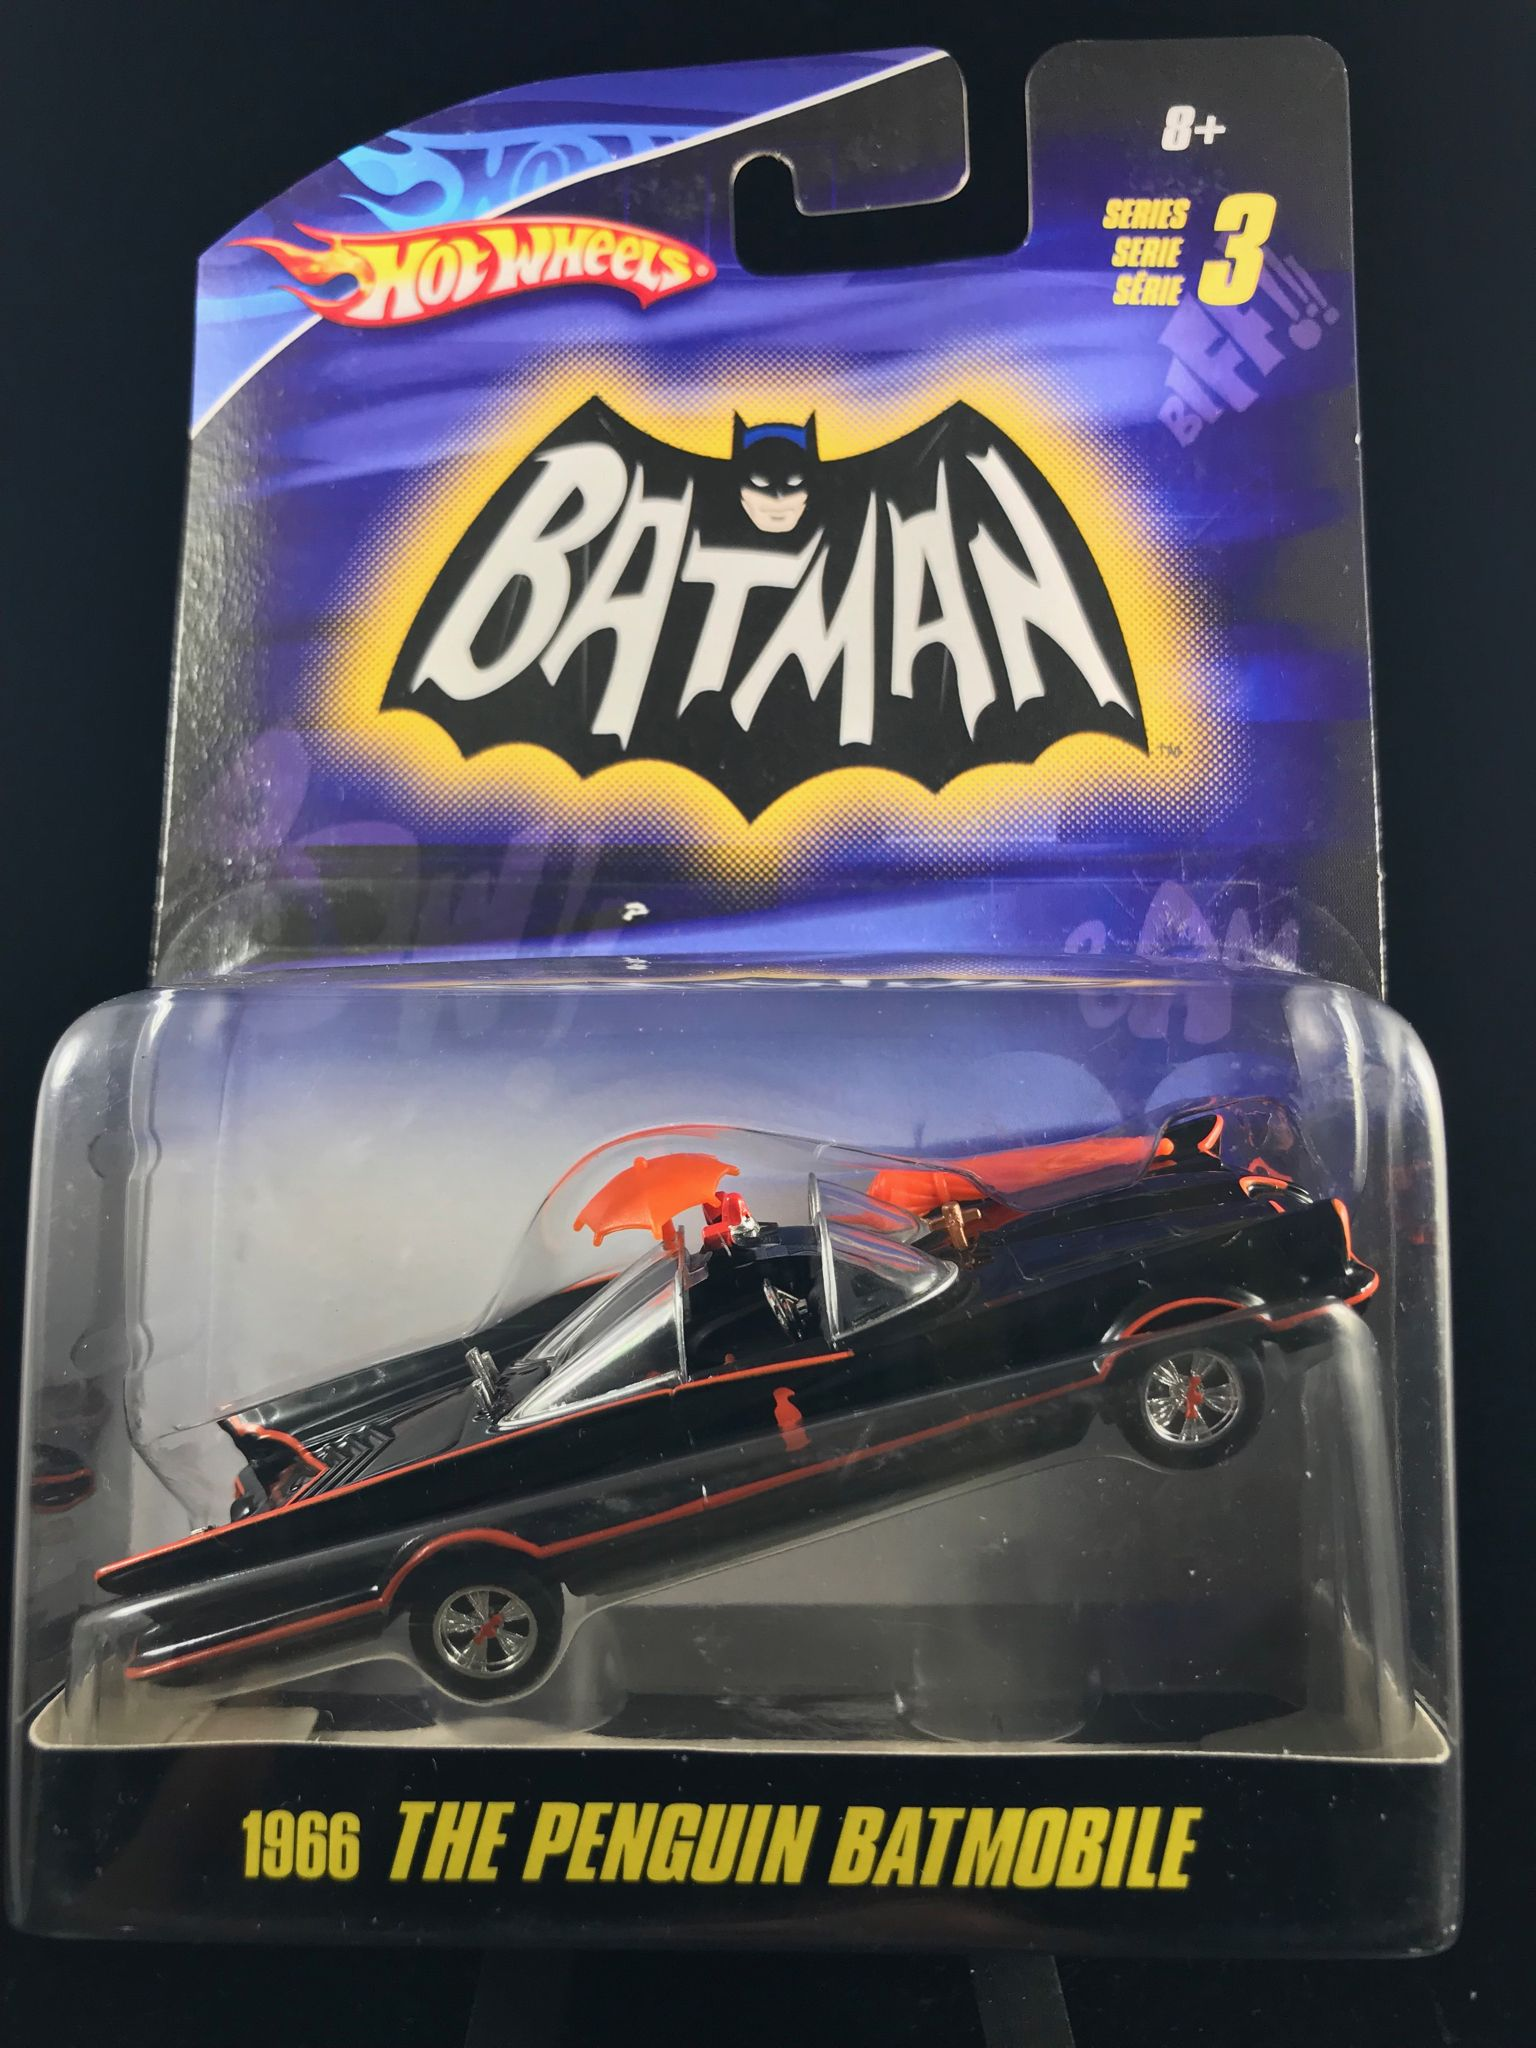 2009 Hot Wheels Series 3 1966 The Penguin Batmobile 1 50 Scale